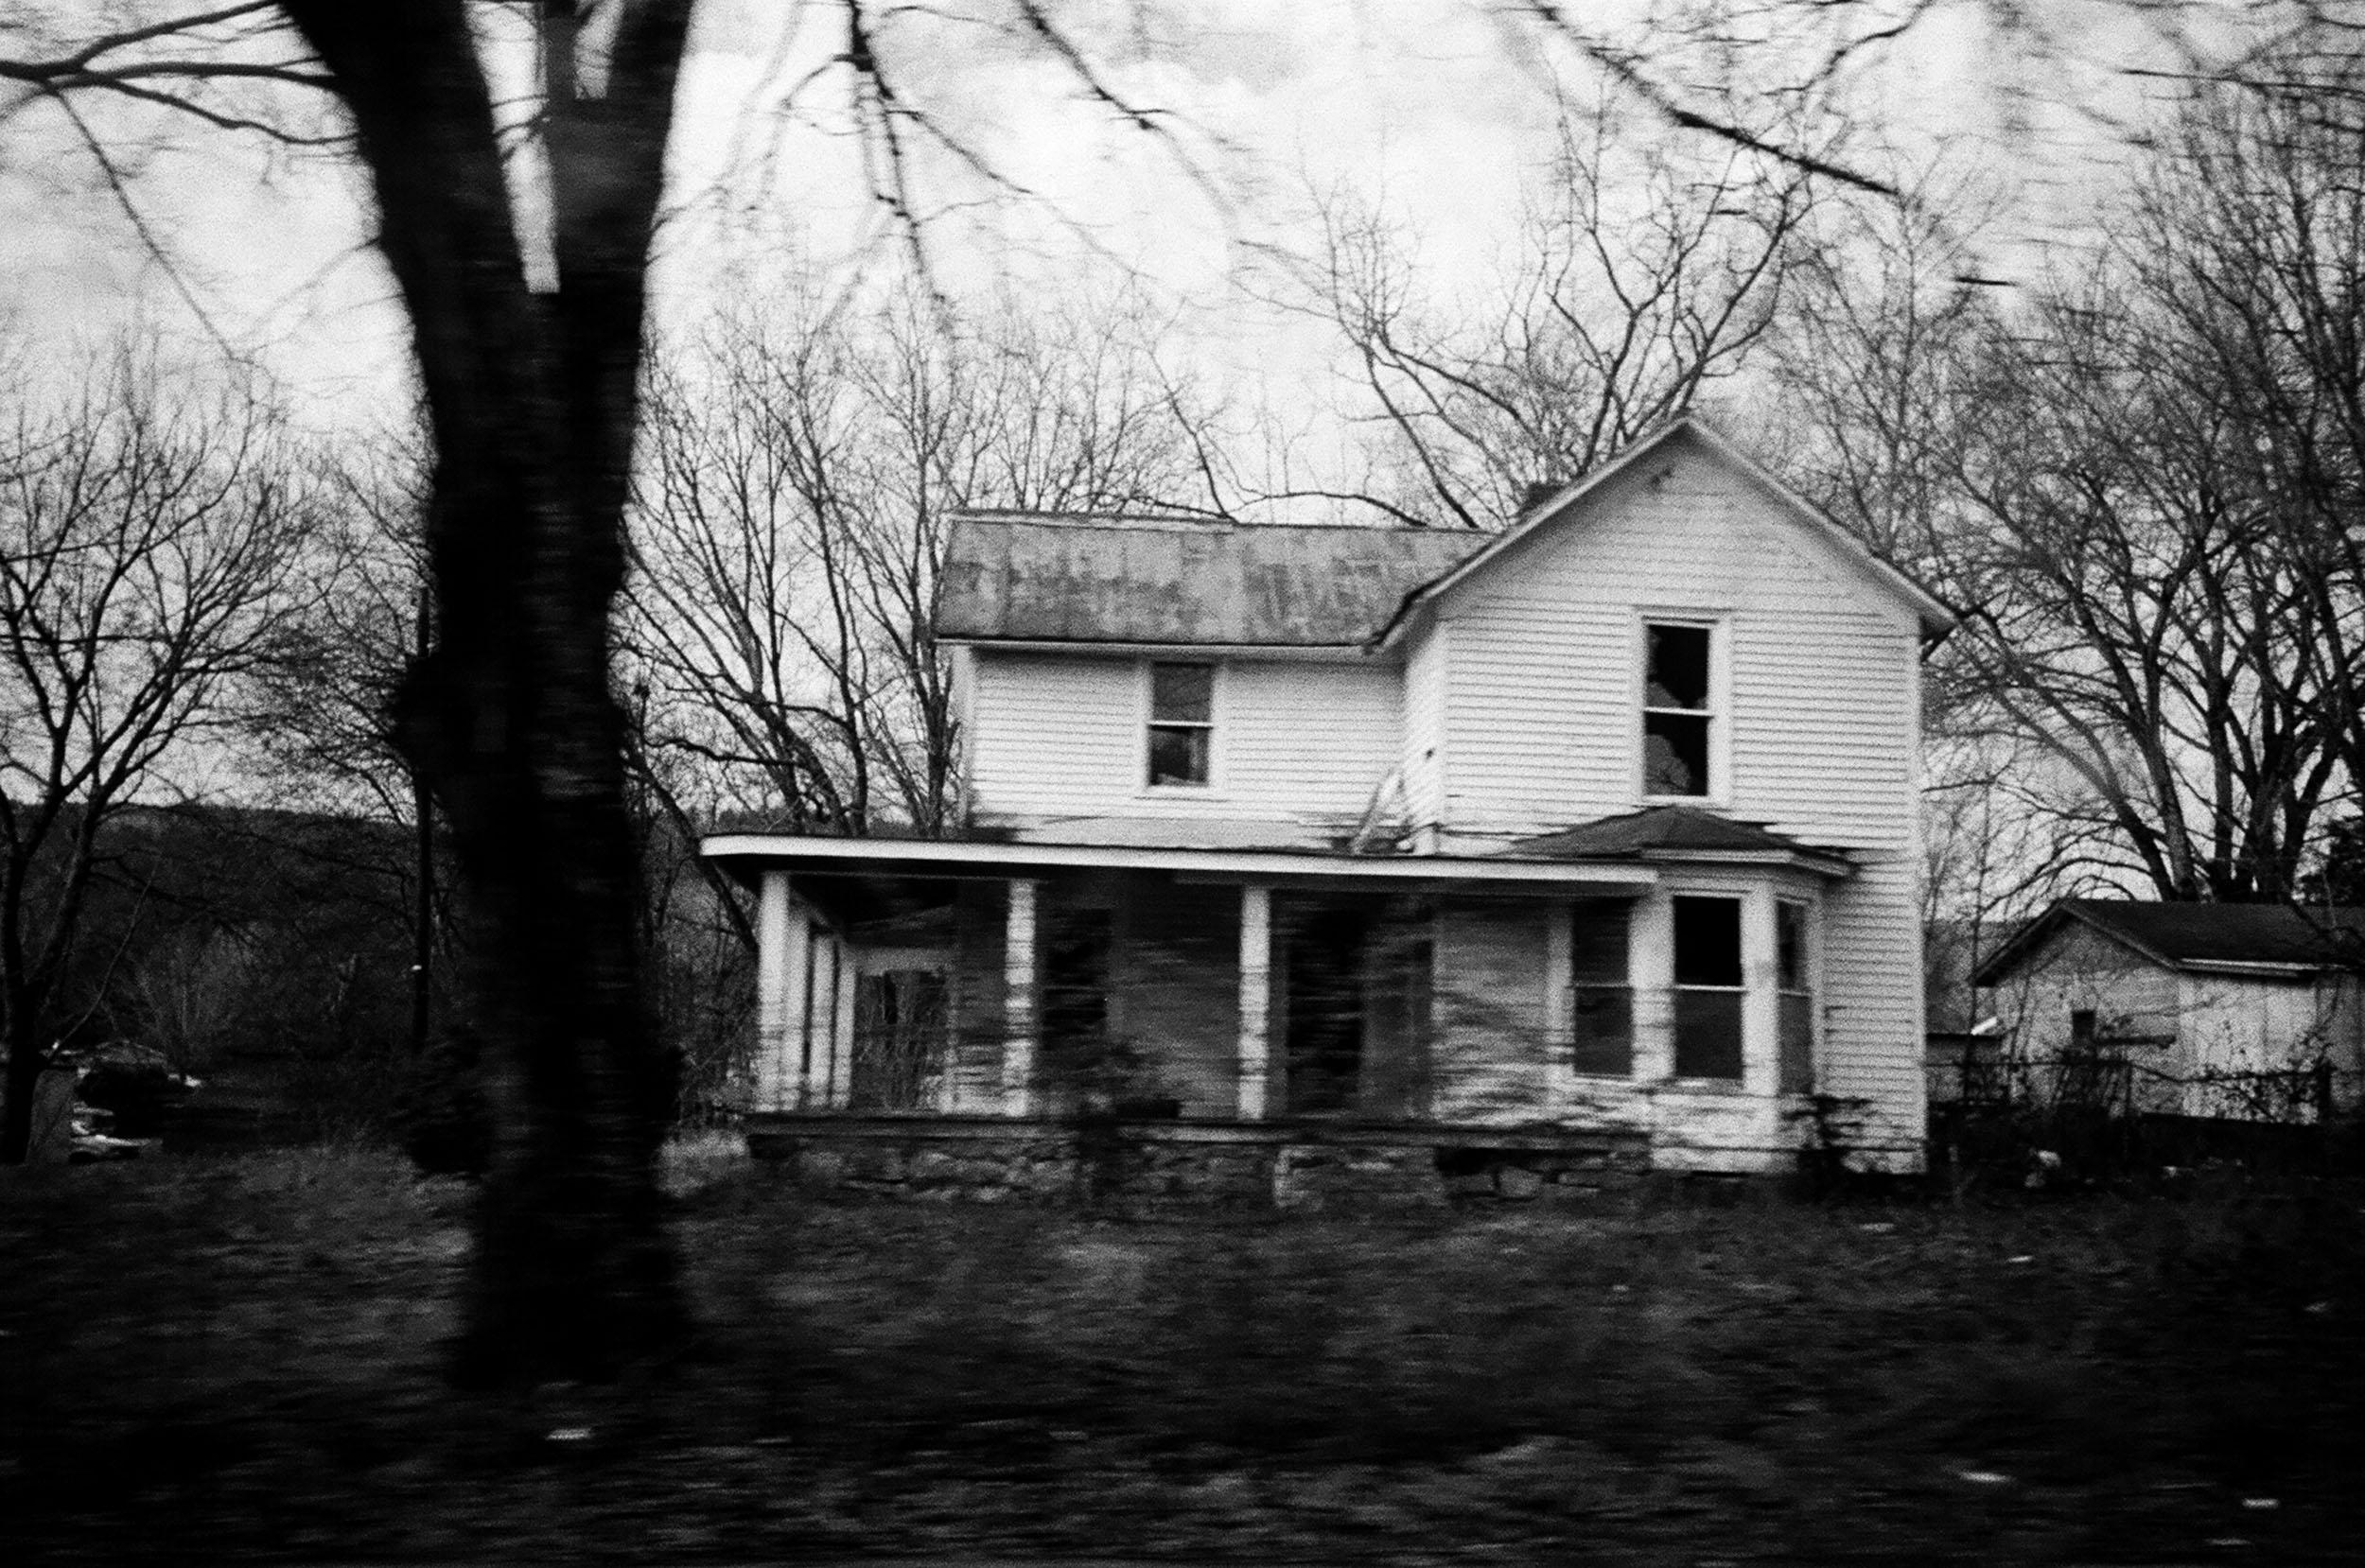 Chattanooga-House-01.jpg